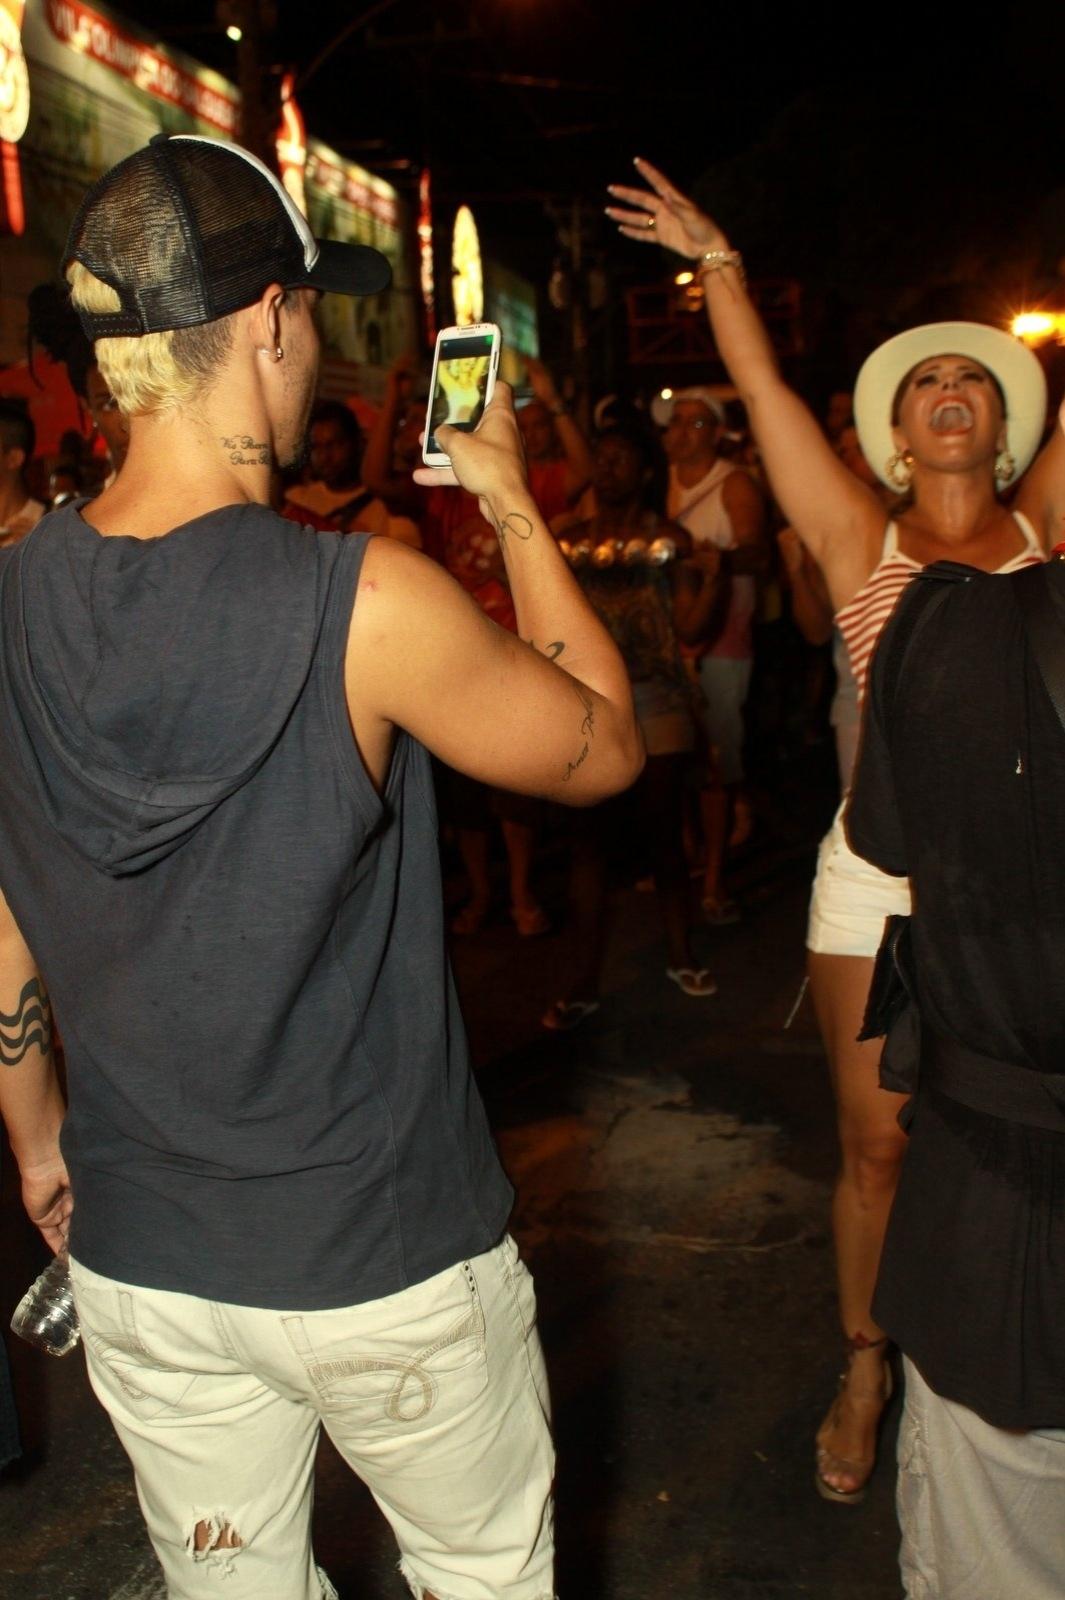 22.jan.2014 - Enquanto Viviane Araújo samba muito, o namorado, Radamés, aproveita para tirar foto da amada